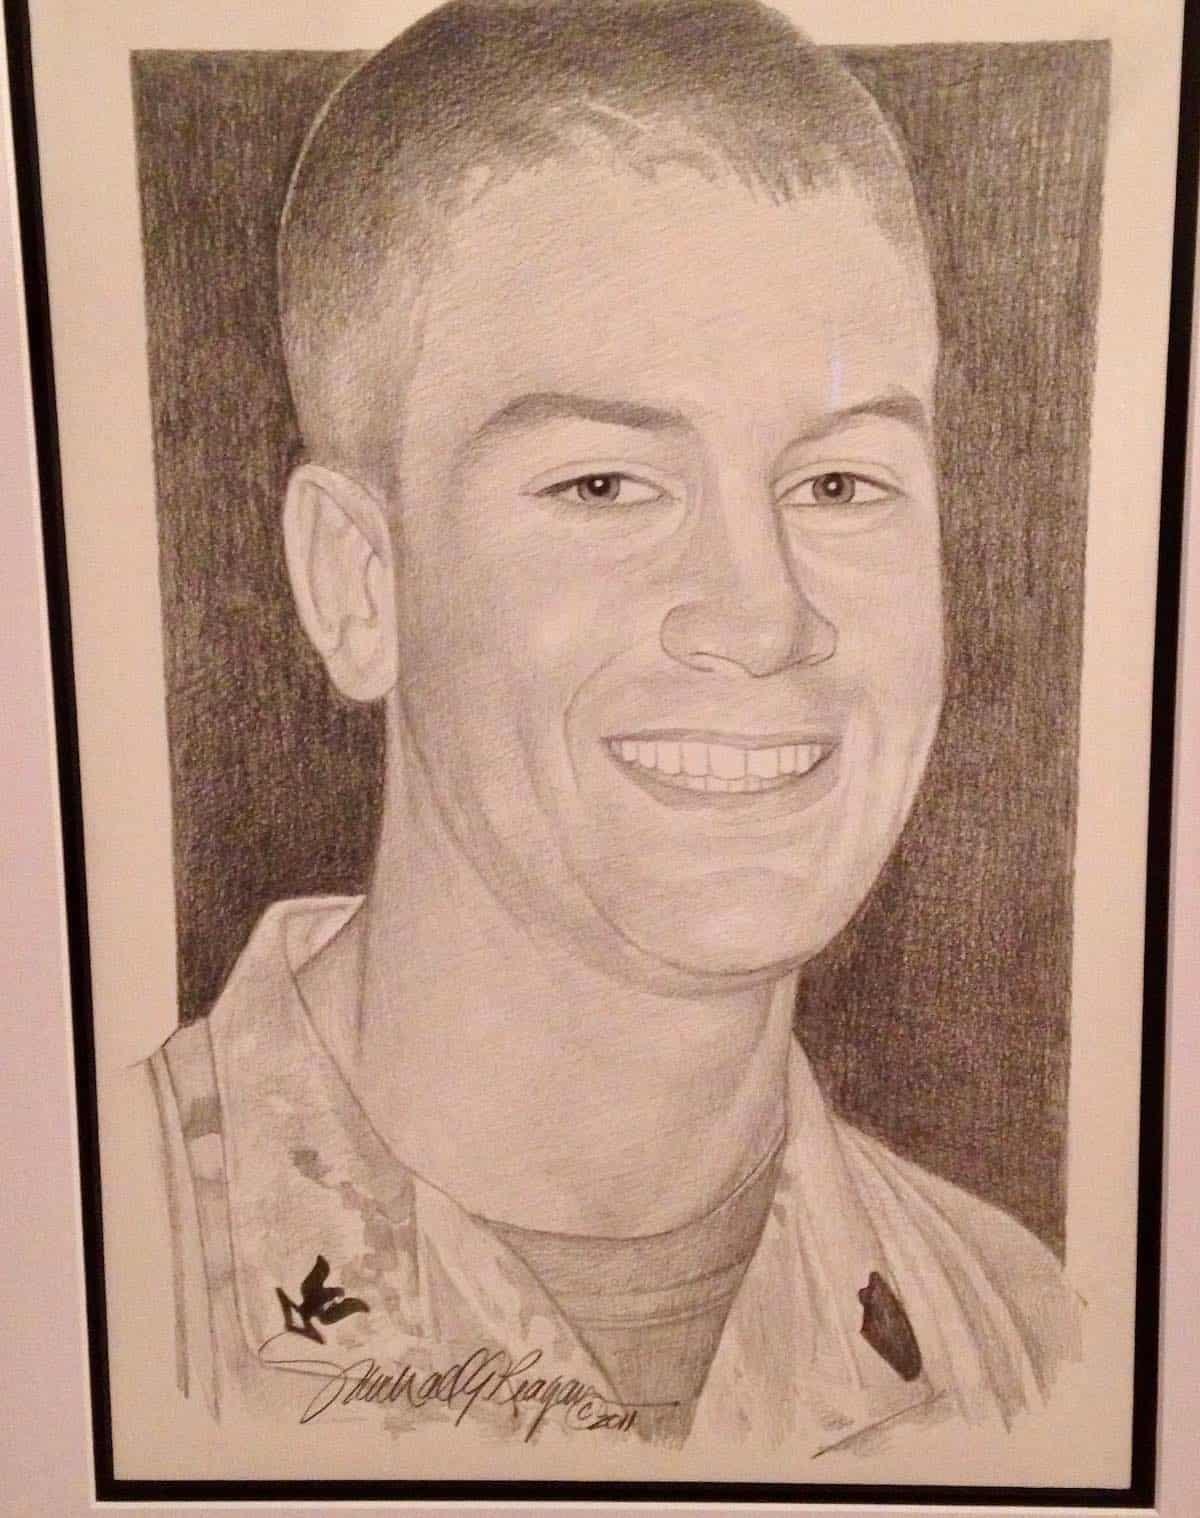 portrait of William by Michael Reagan